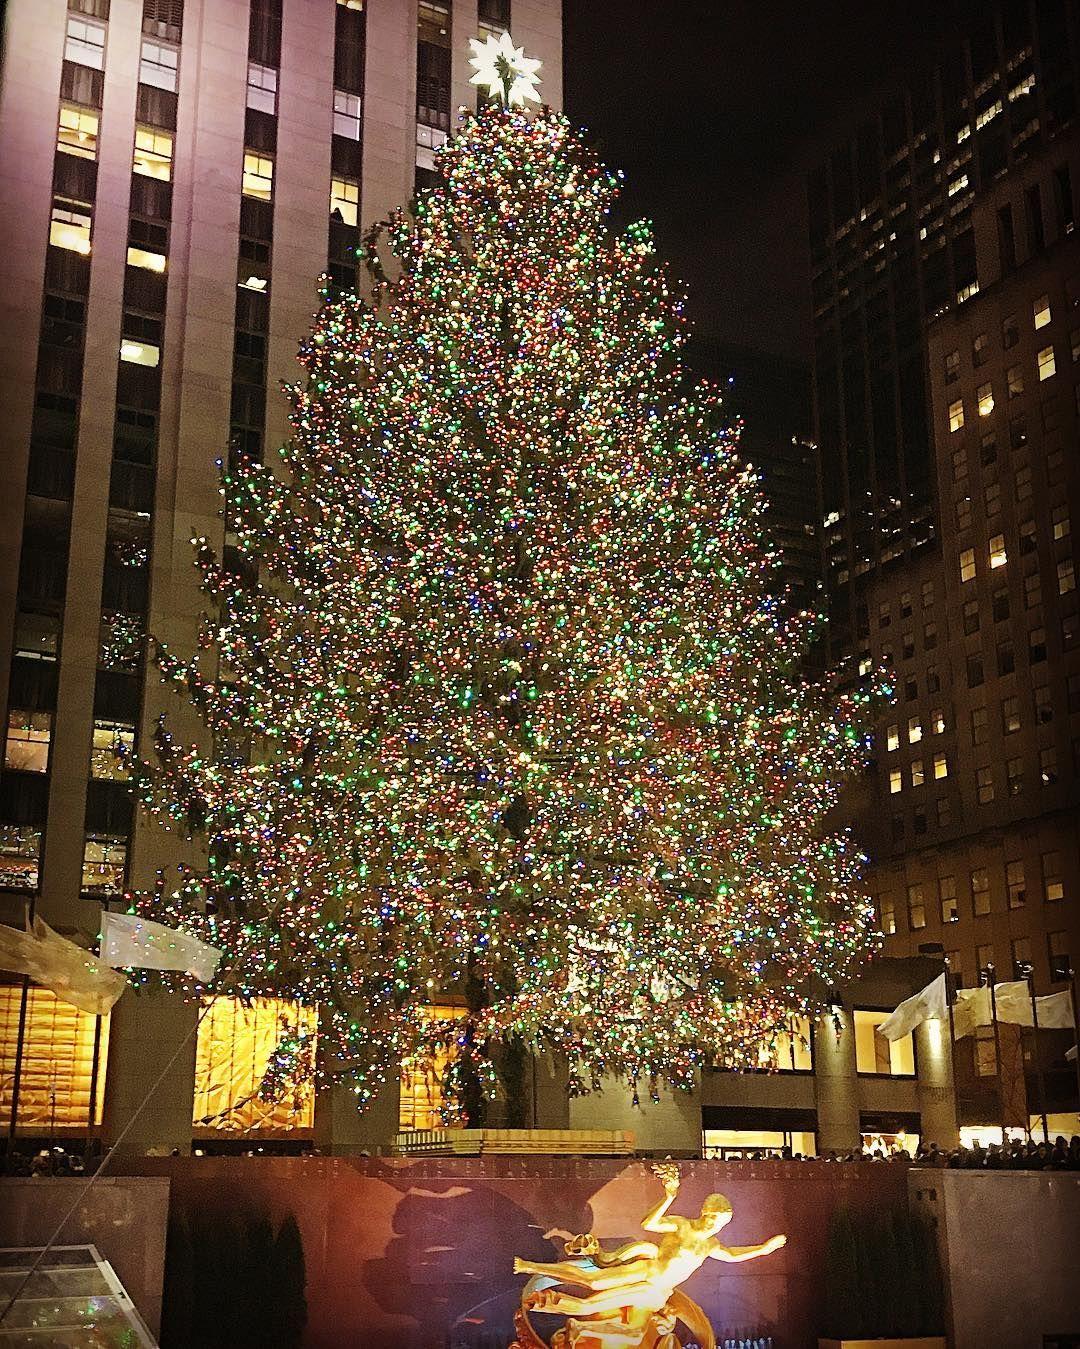 Christmas is here ❤️ #Noël #rockefellerchristmastree